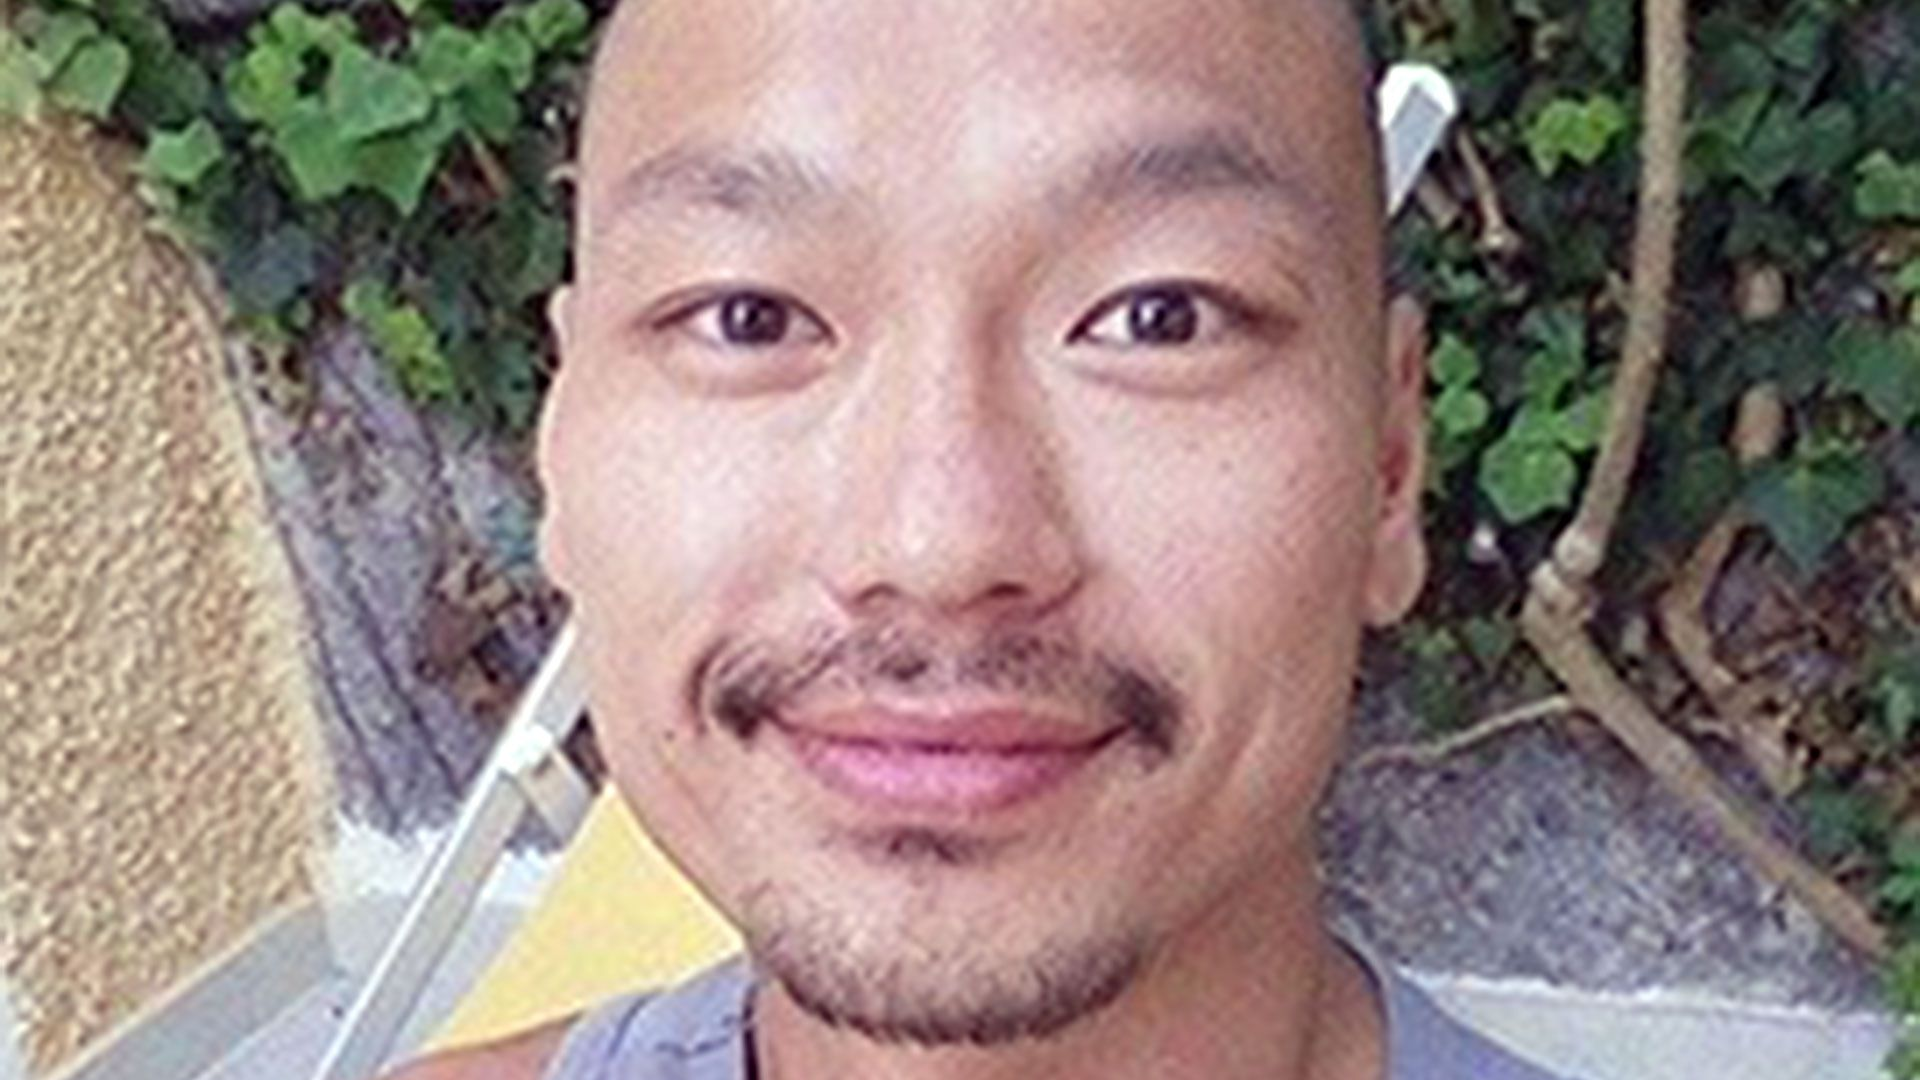 Peter Choi, el profesor de inglés de 35 años que murió en Irak